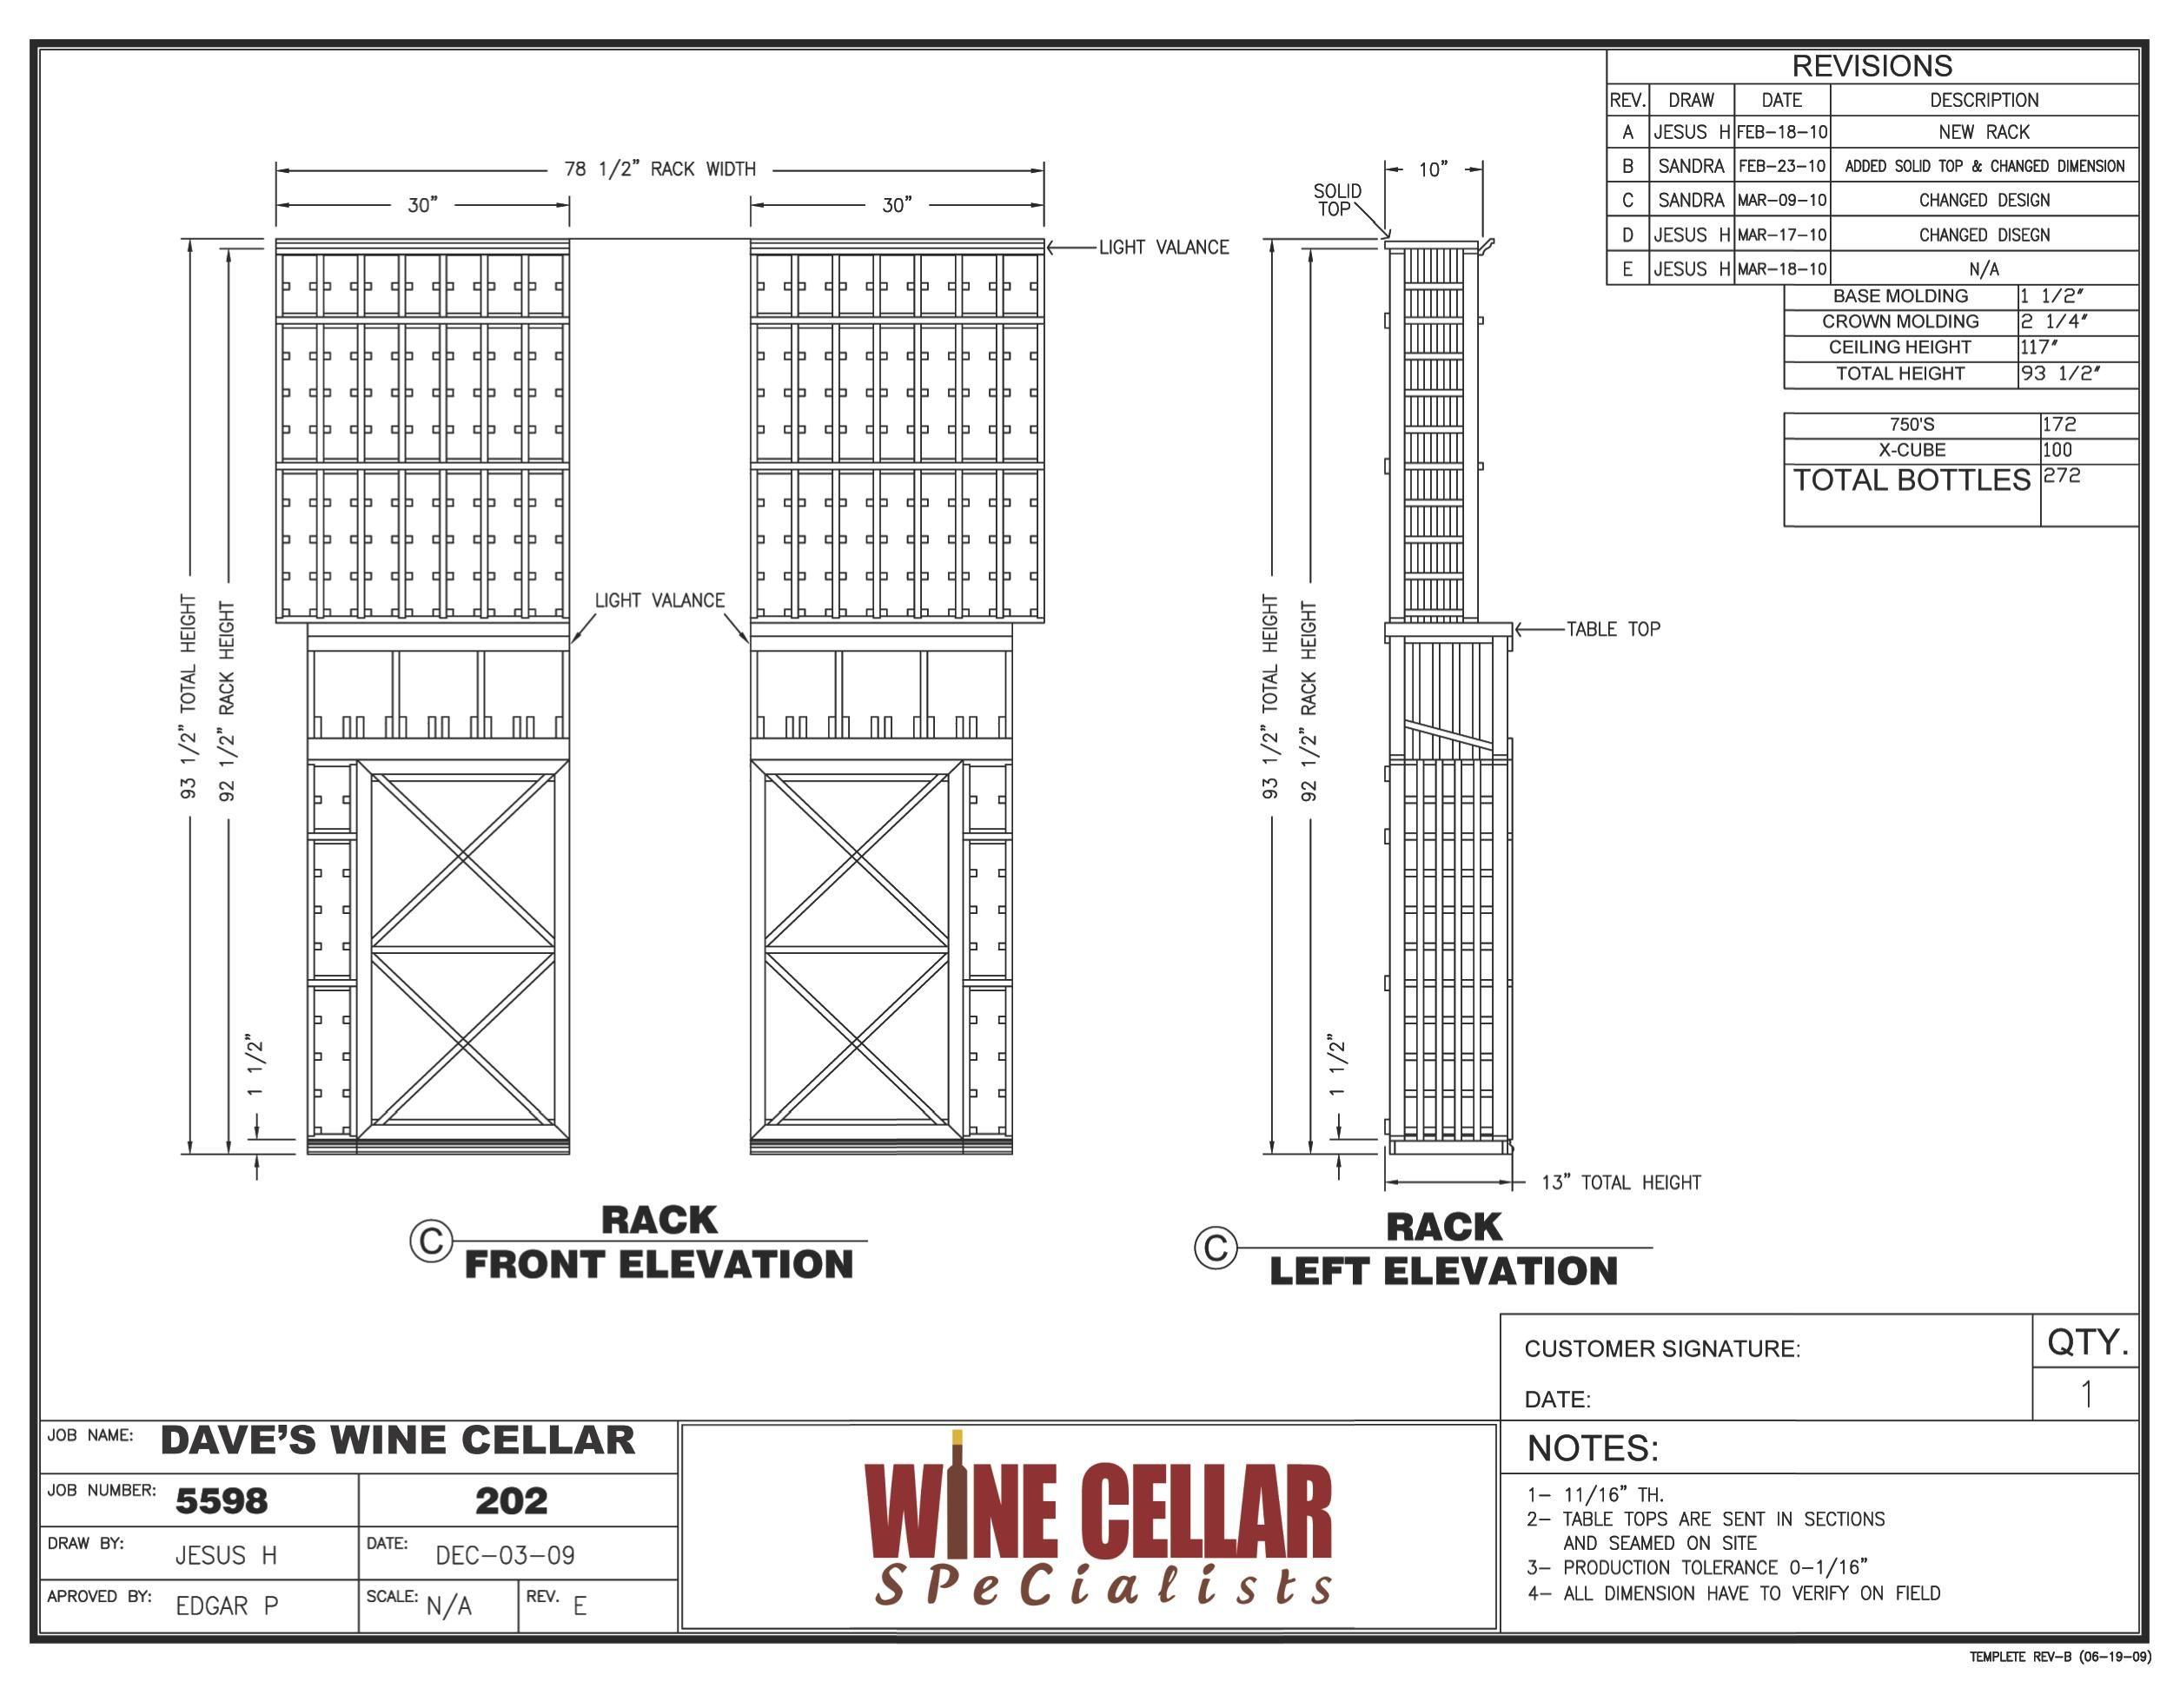 Custom Wine Racks Chicago Illinois Design Drawing Elevation For Dave S Custom Wine Cellar Project View More W Custom Wine Cellars Wine Cellar Custom Wine Rack